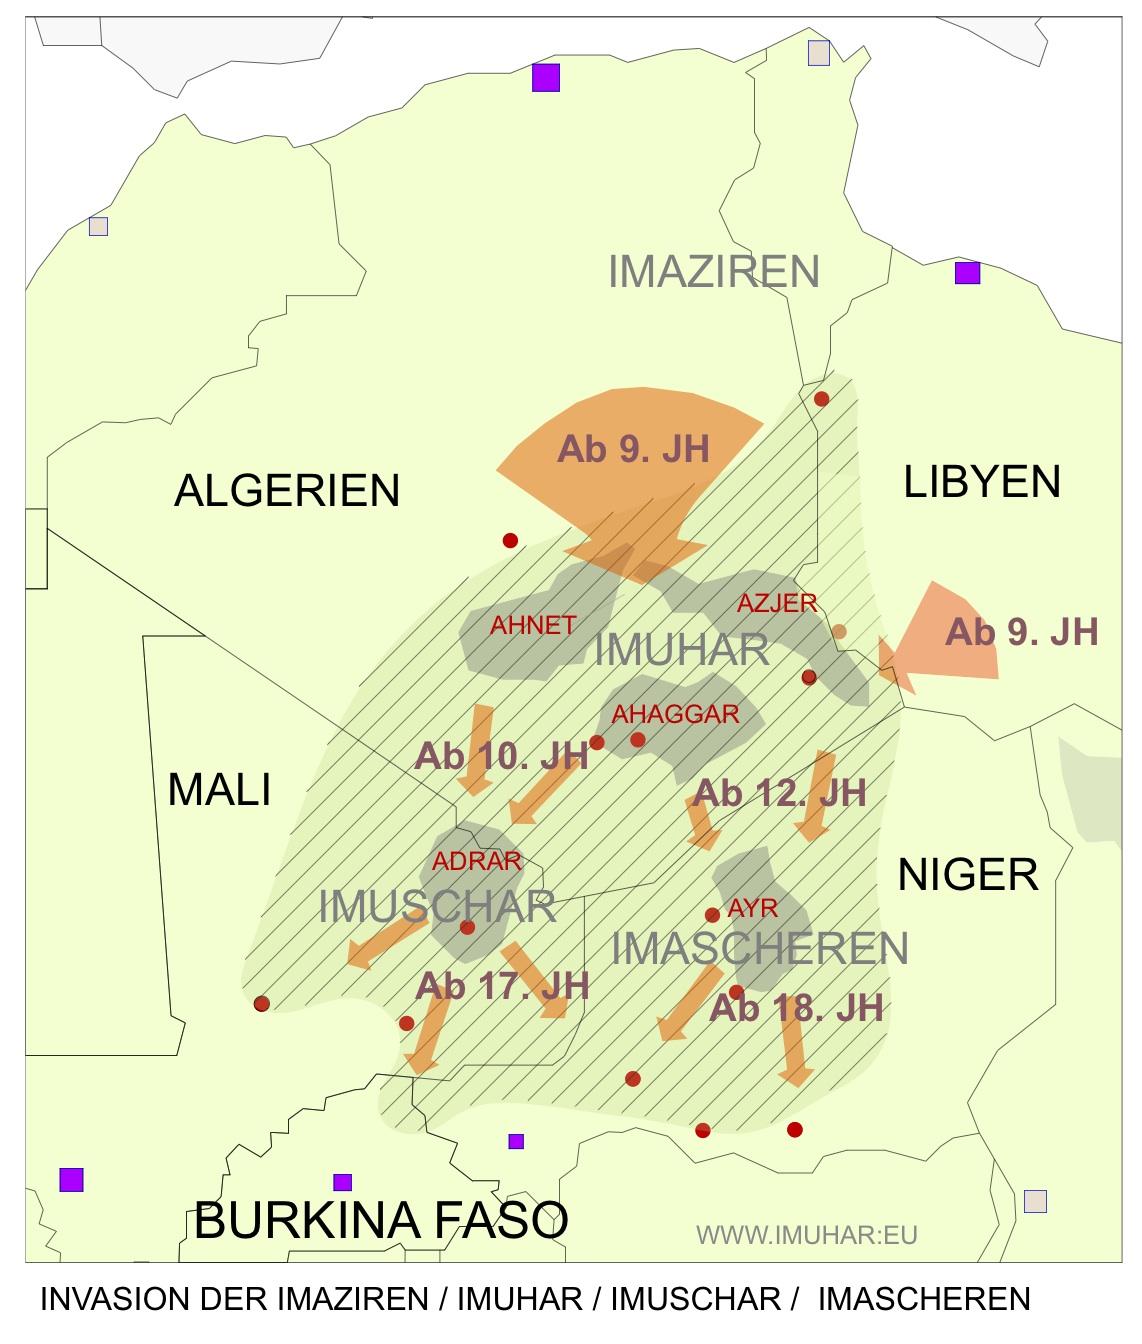 Anja Fischer / Imuhar (Tuareg) - History1